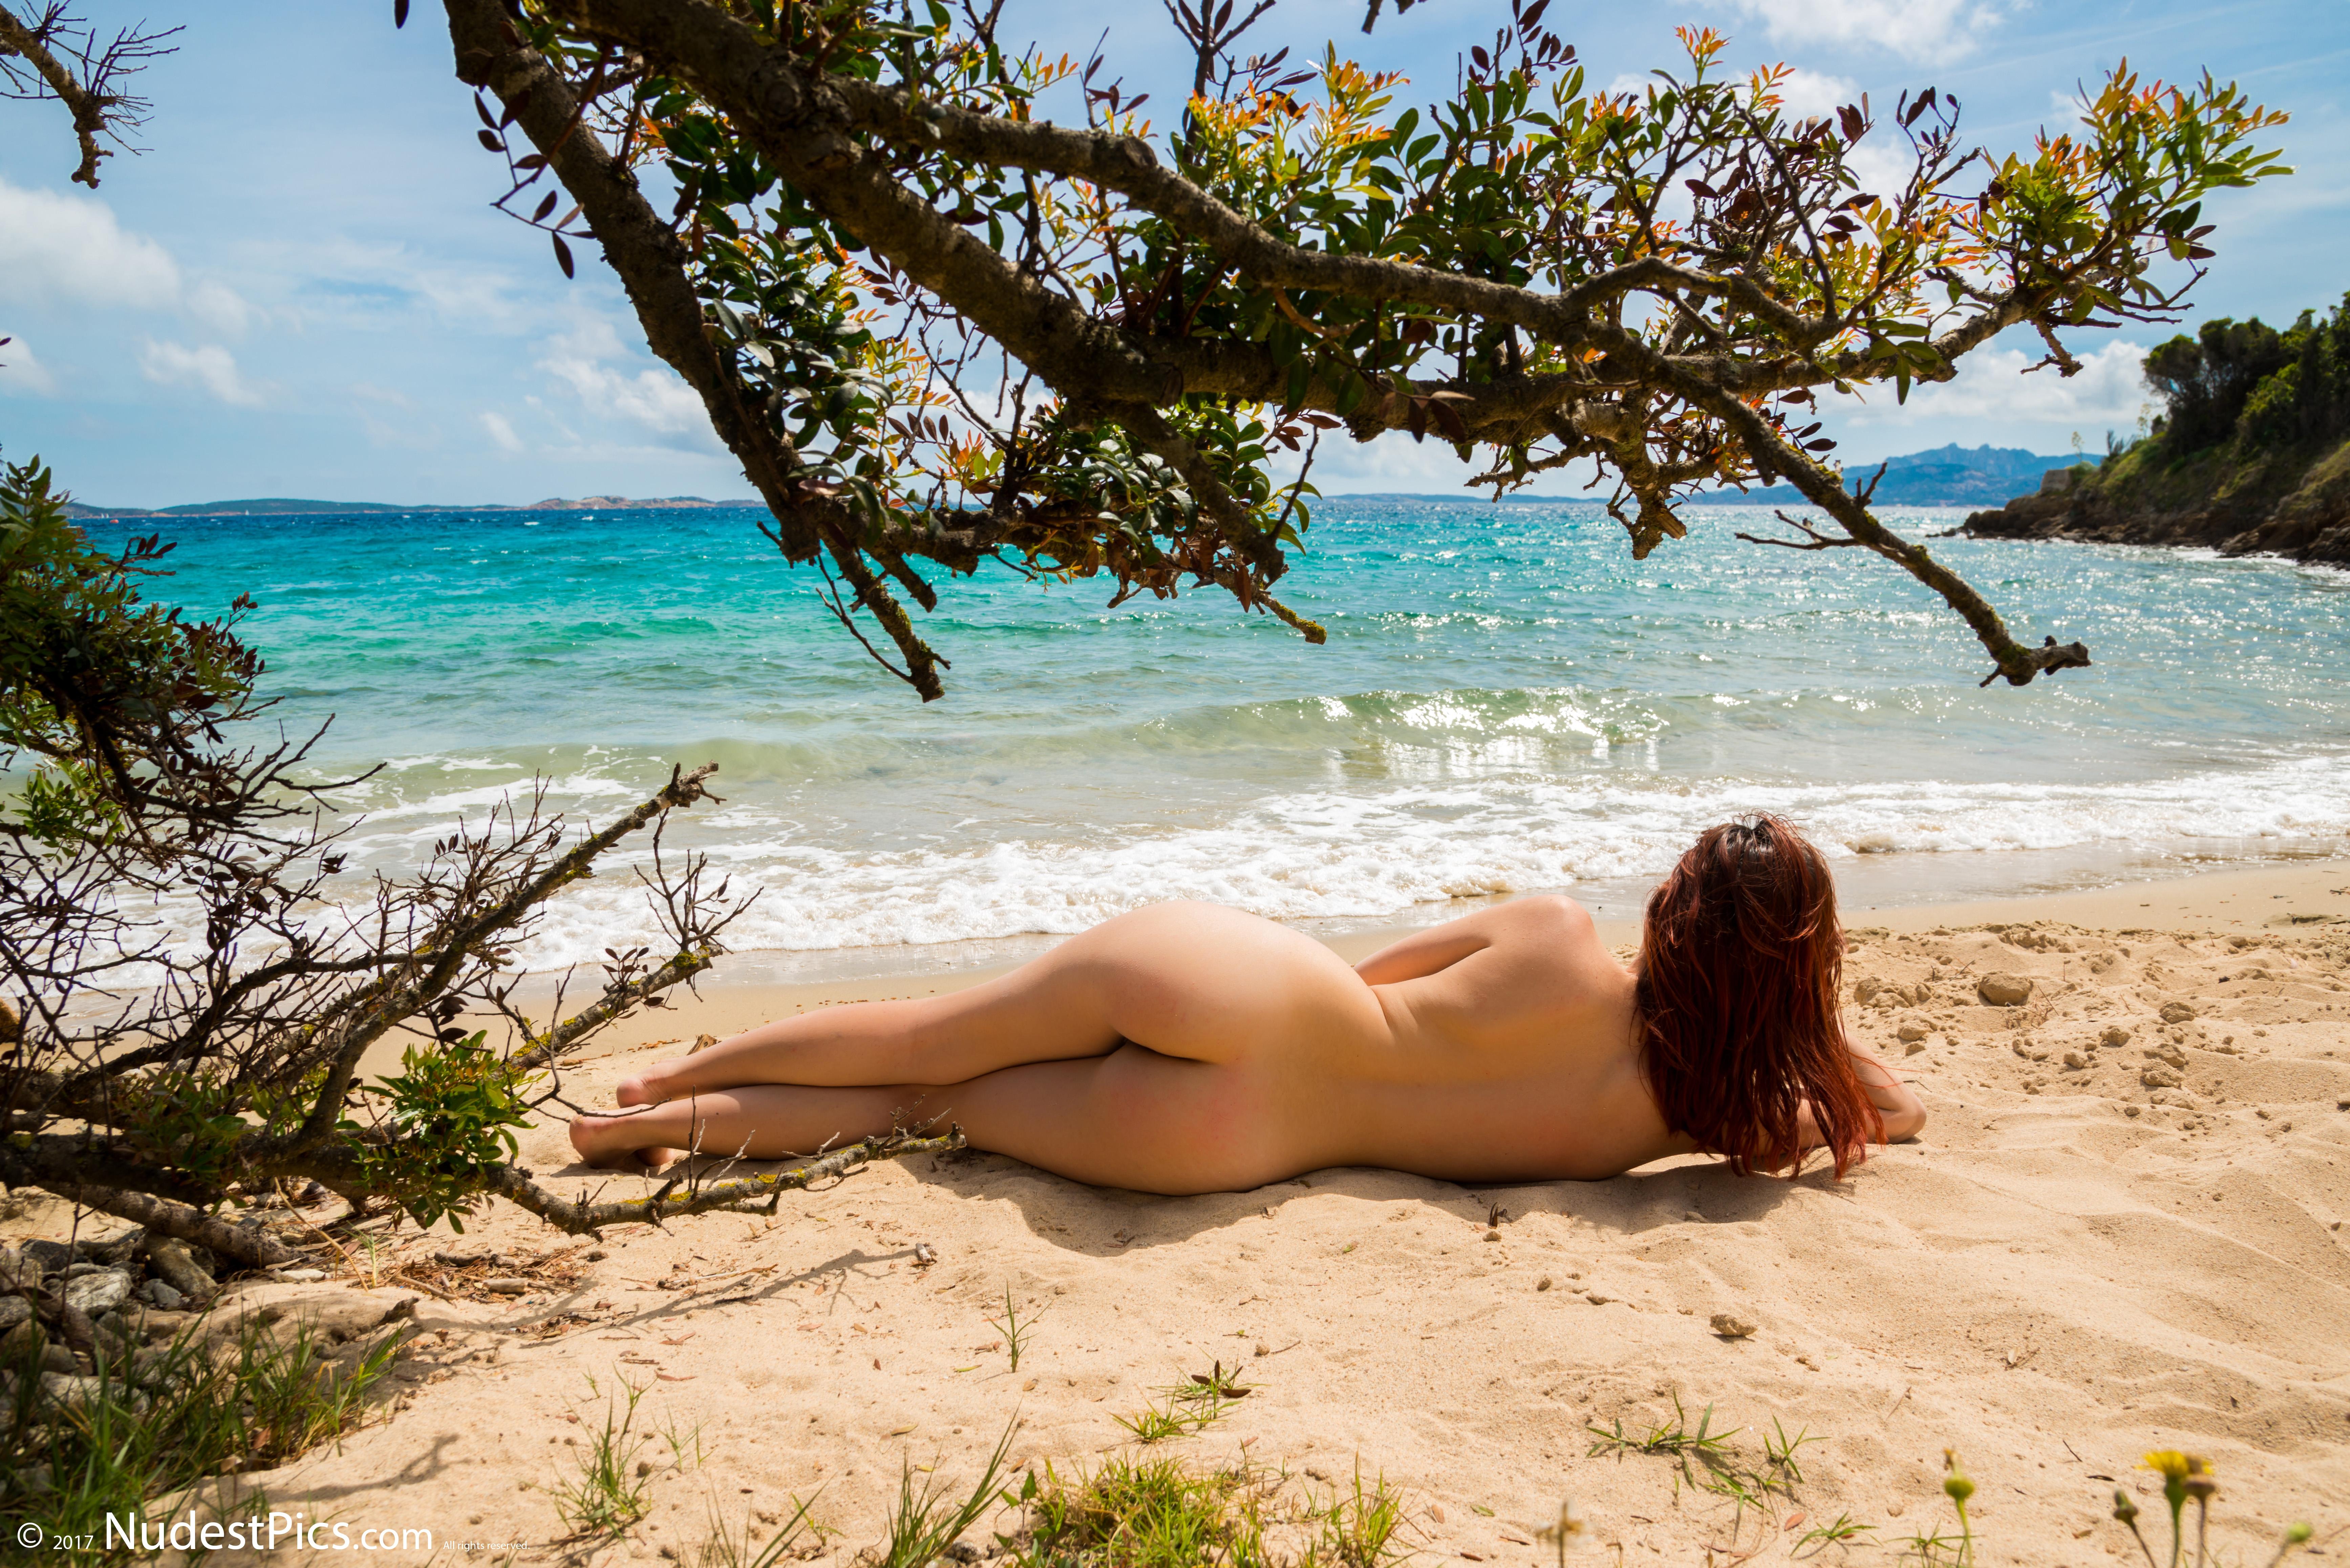 Woman Sunbathing on Nudist Beach HD